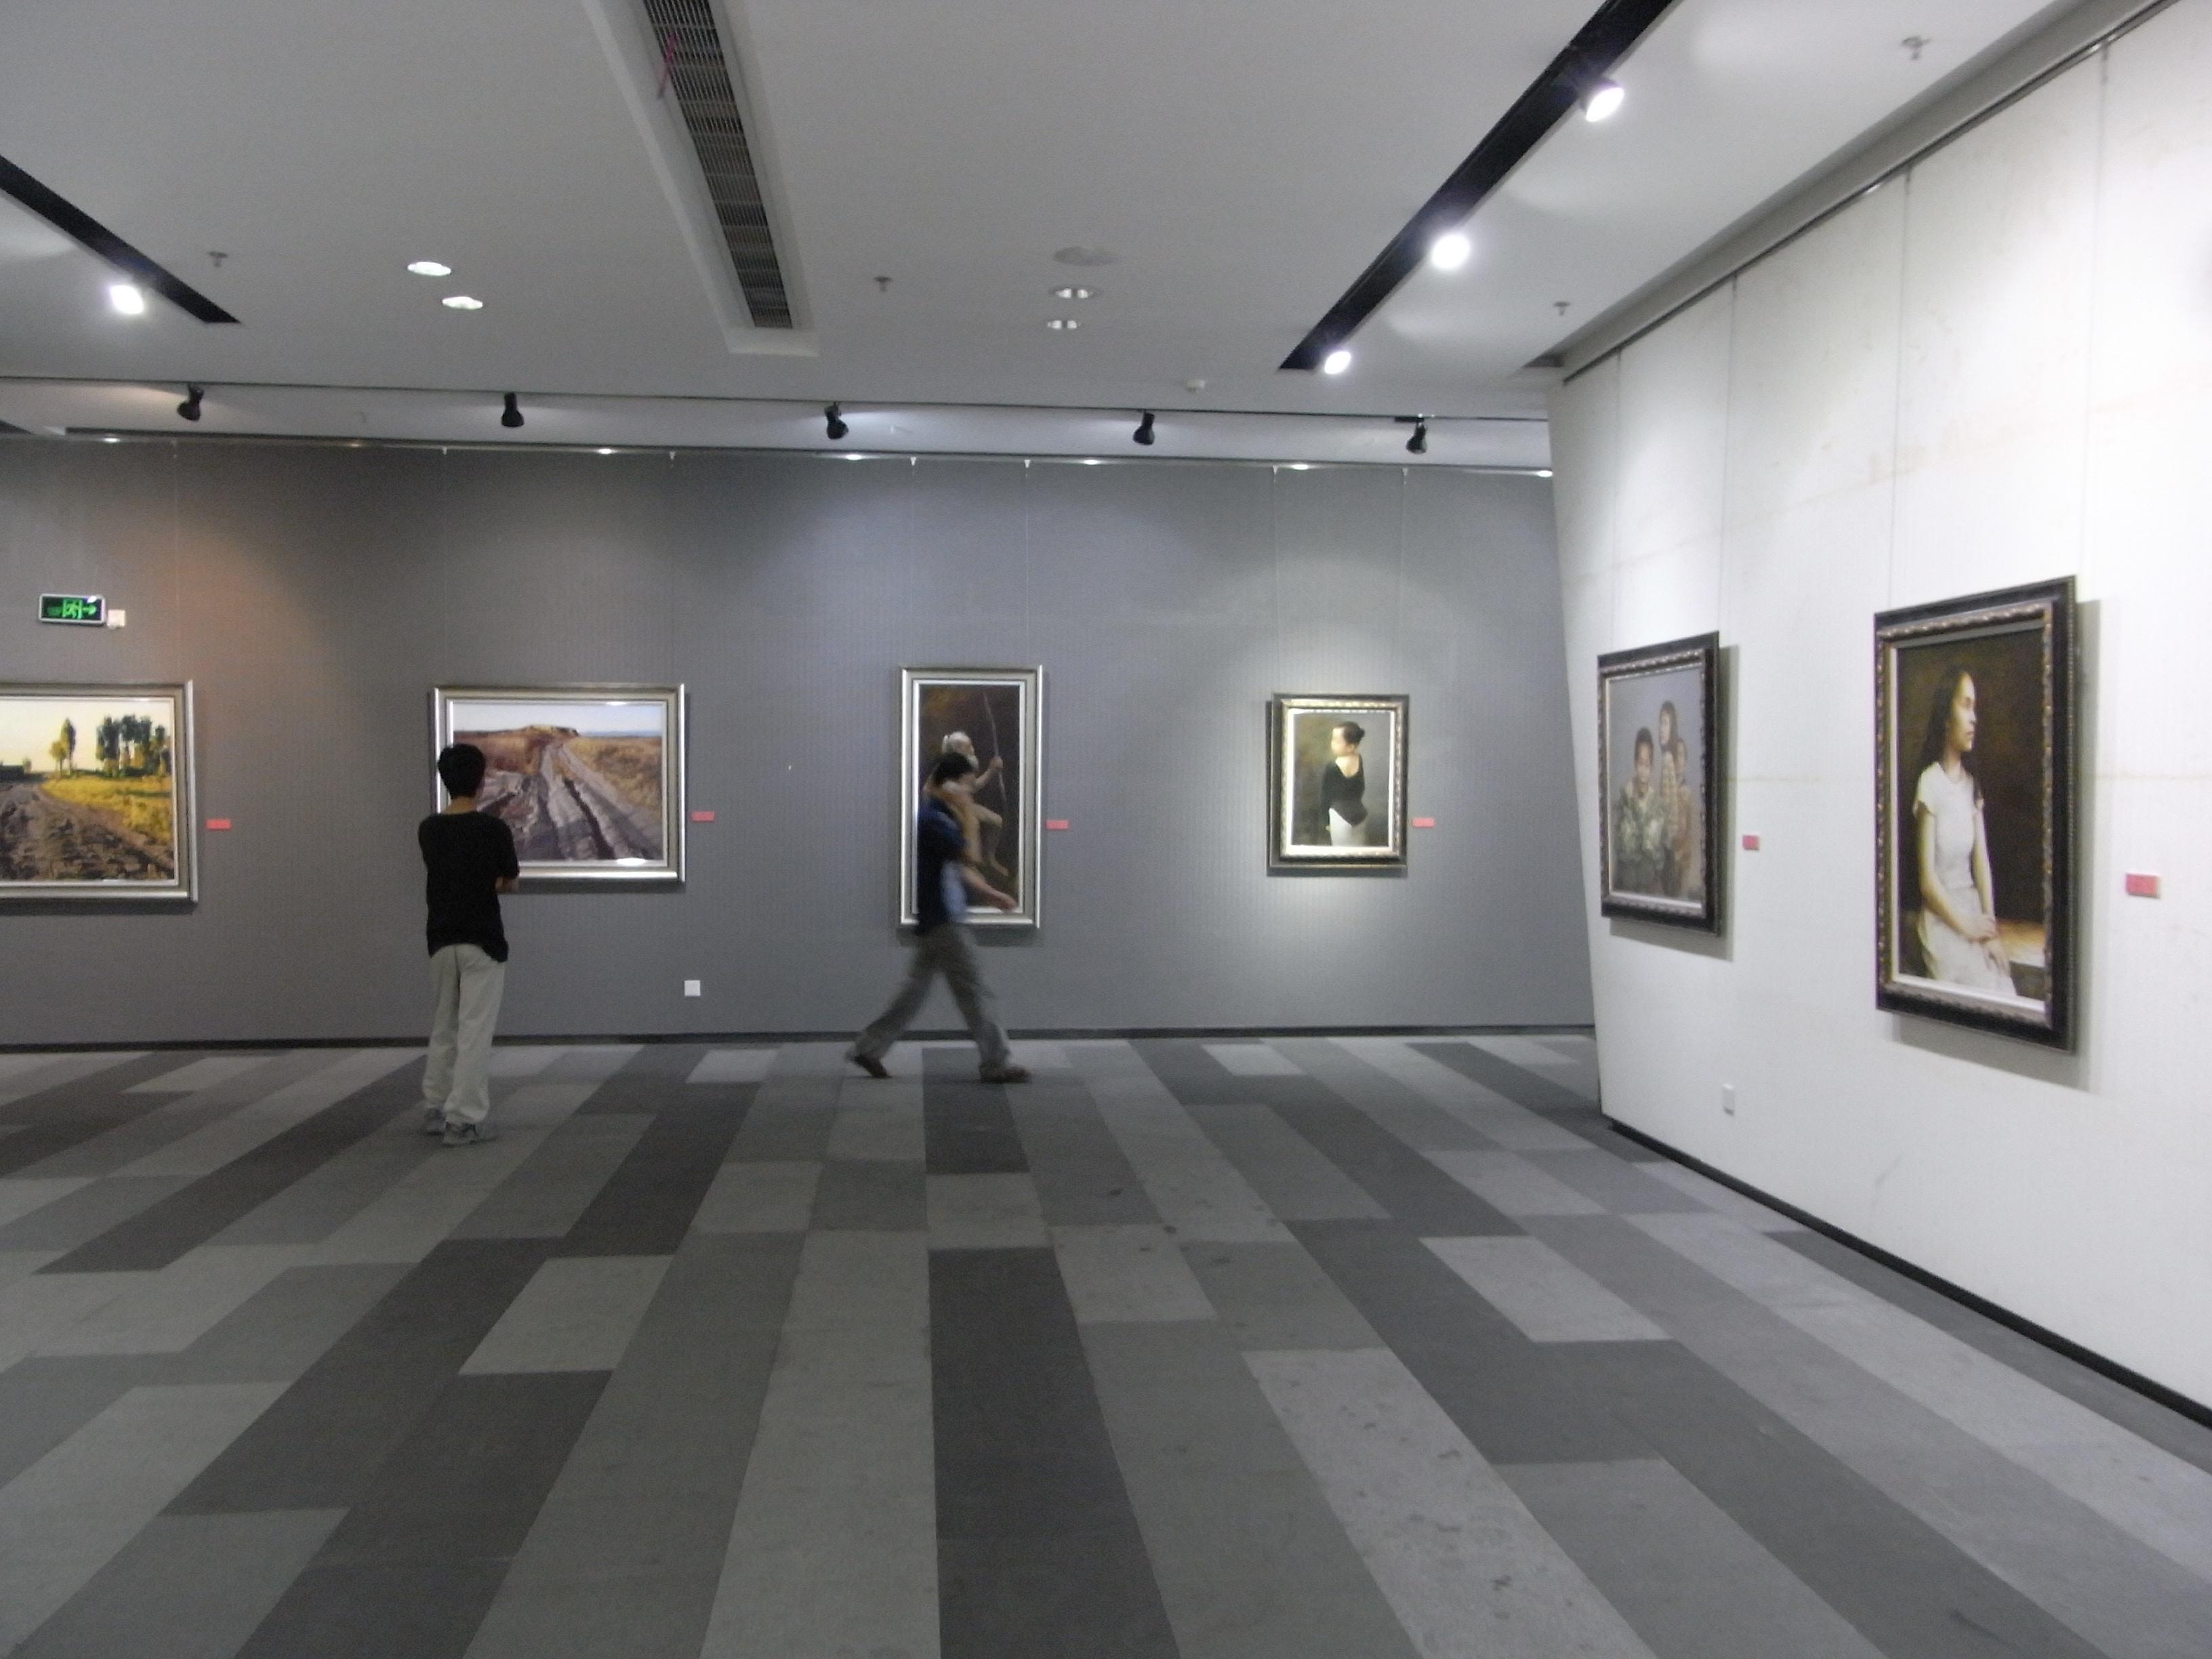 Art In Paradise D Exhibition Hall : File sz 深圳 大芬油畫村 da fen oil painting village art gallery